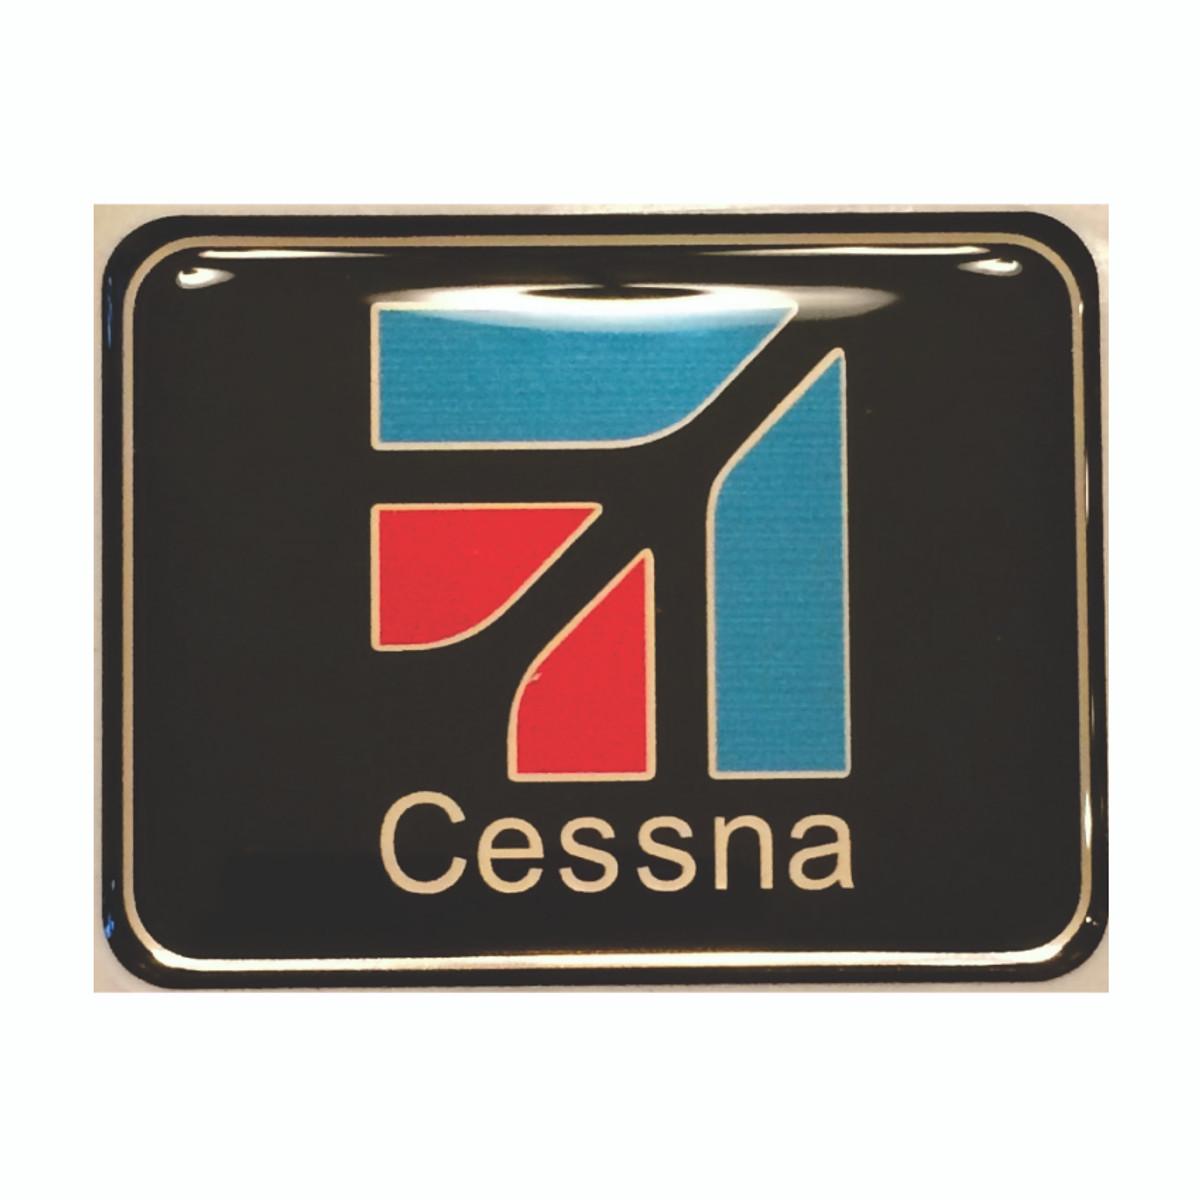 Cessna seatbelt emblem